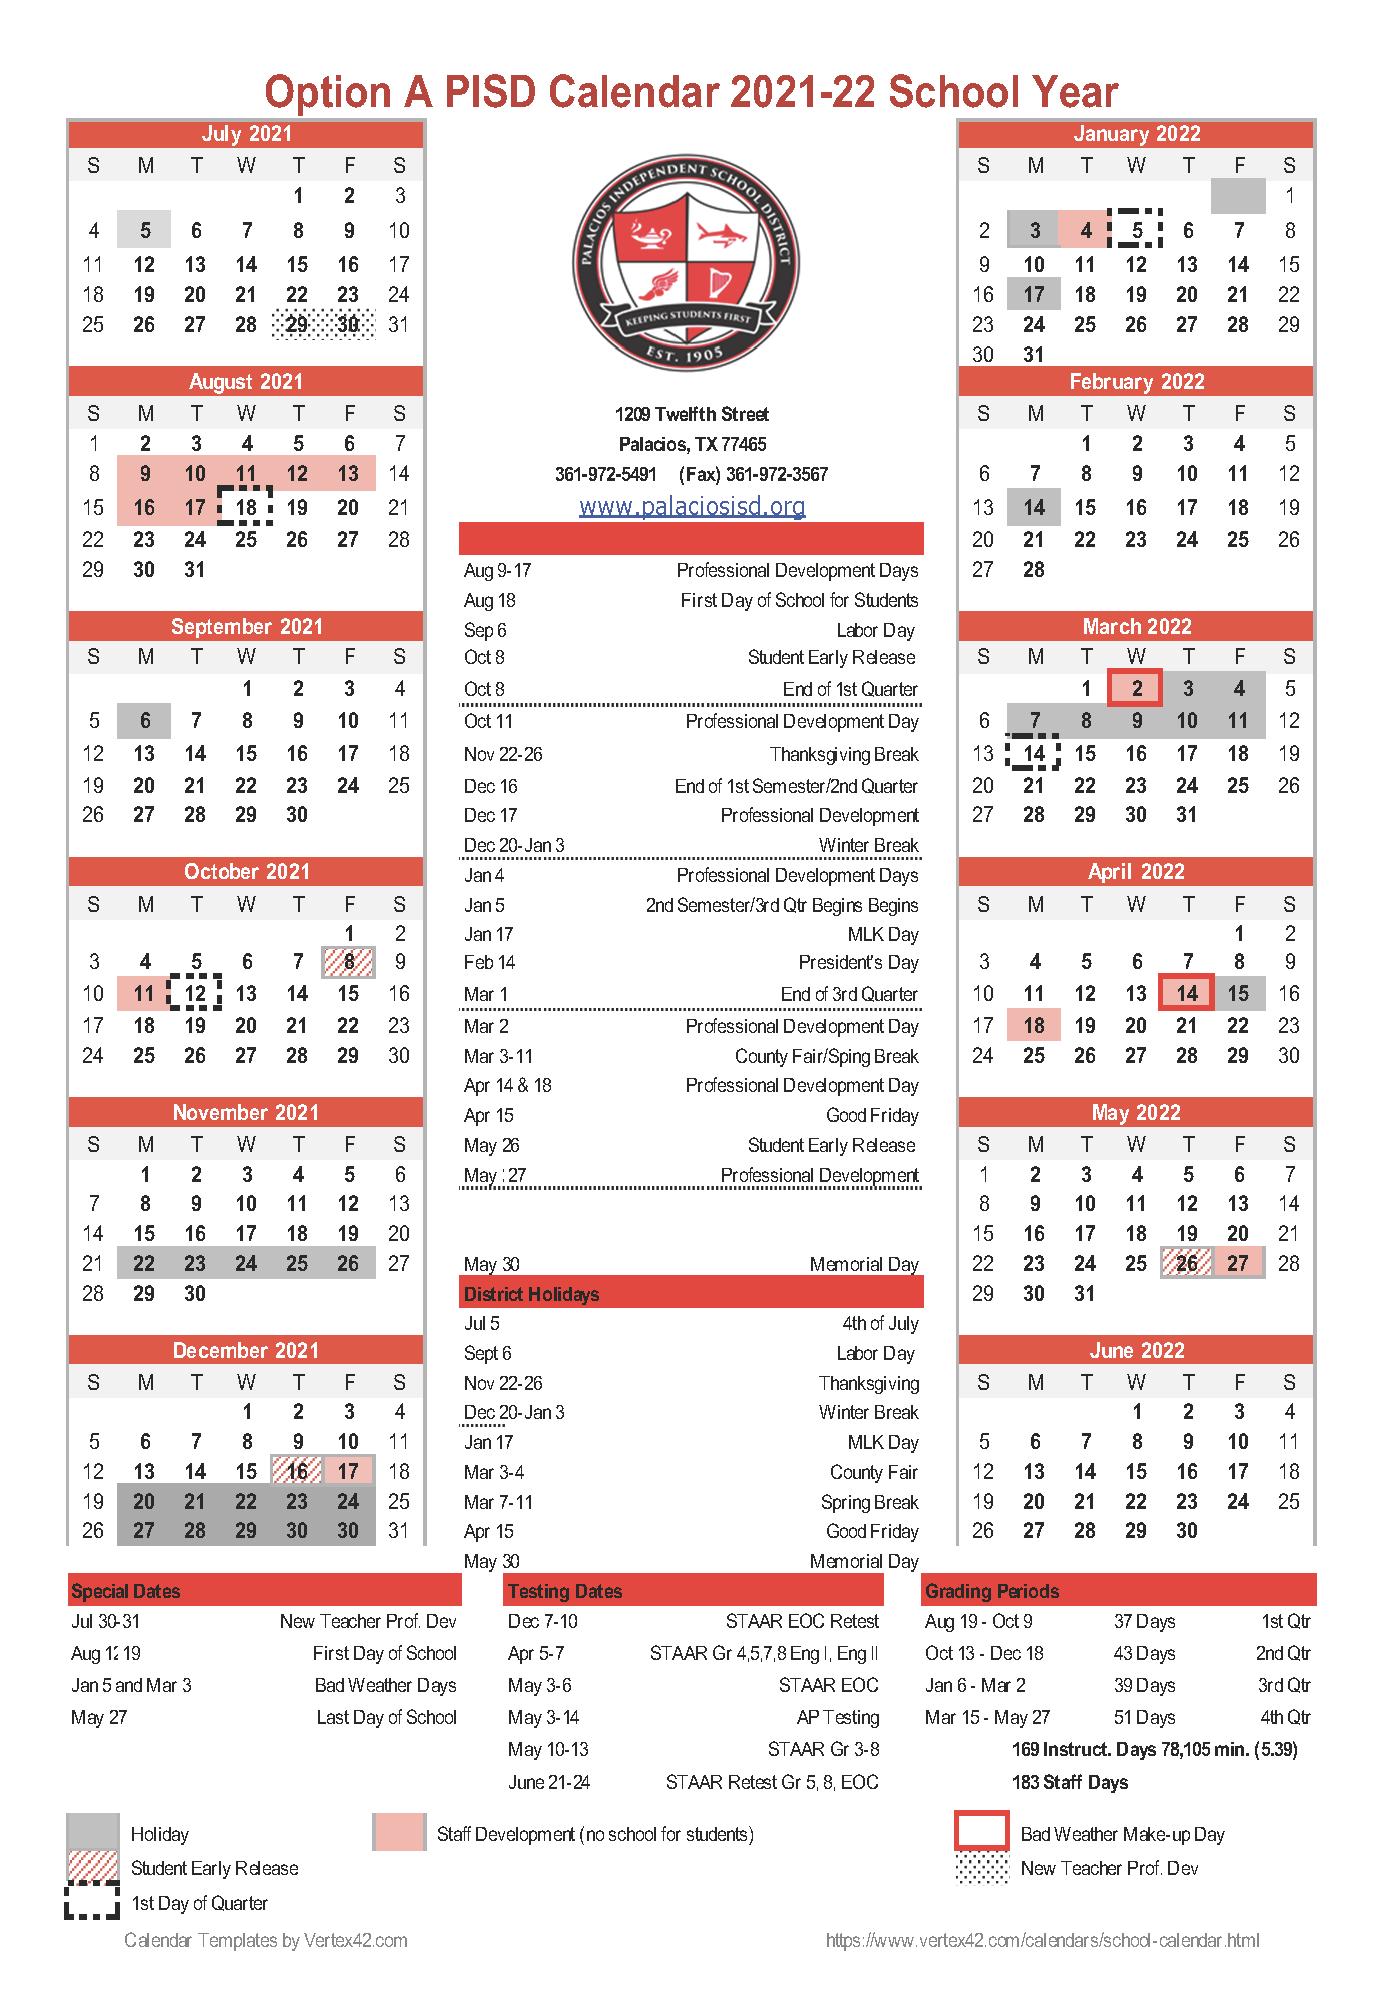 Weather Calendar 2022.2021 2022 Pisd Calendar Survey